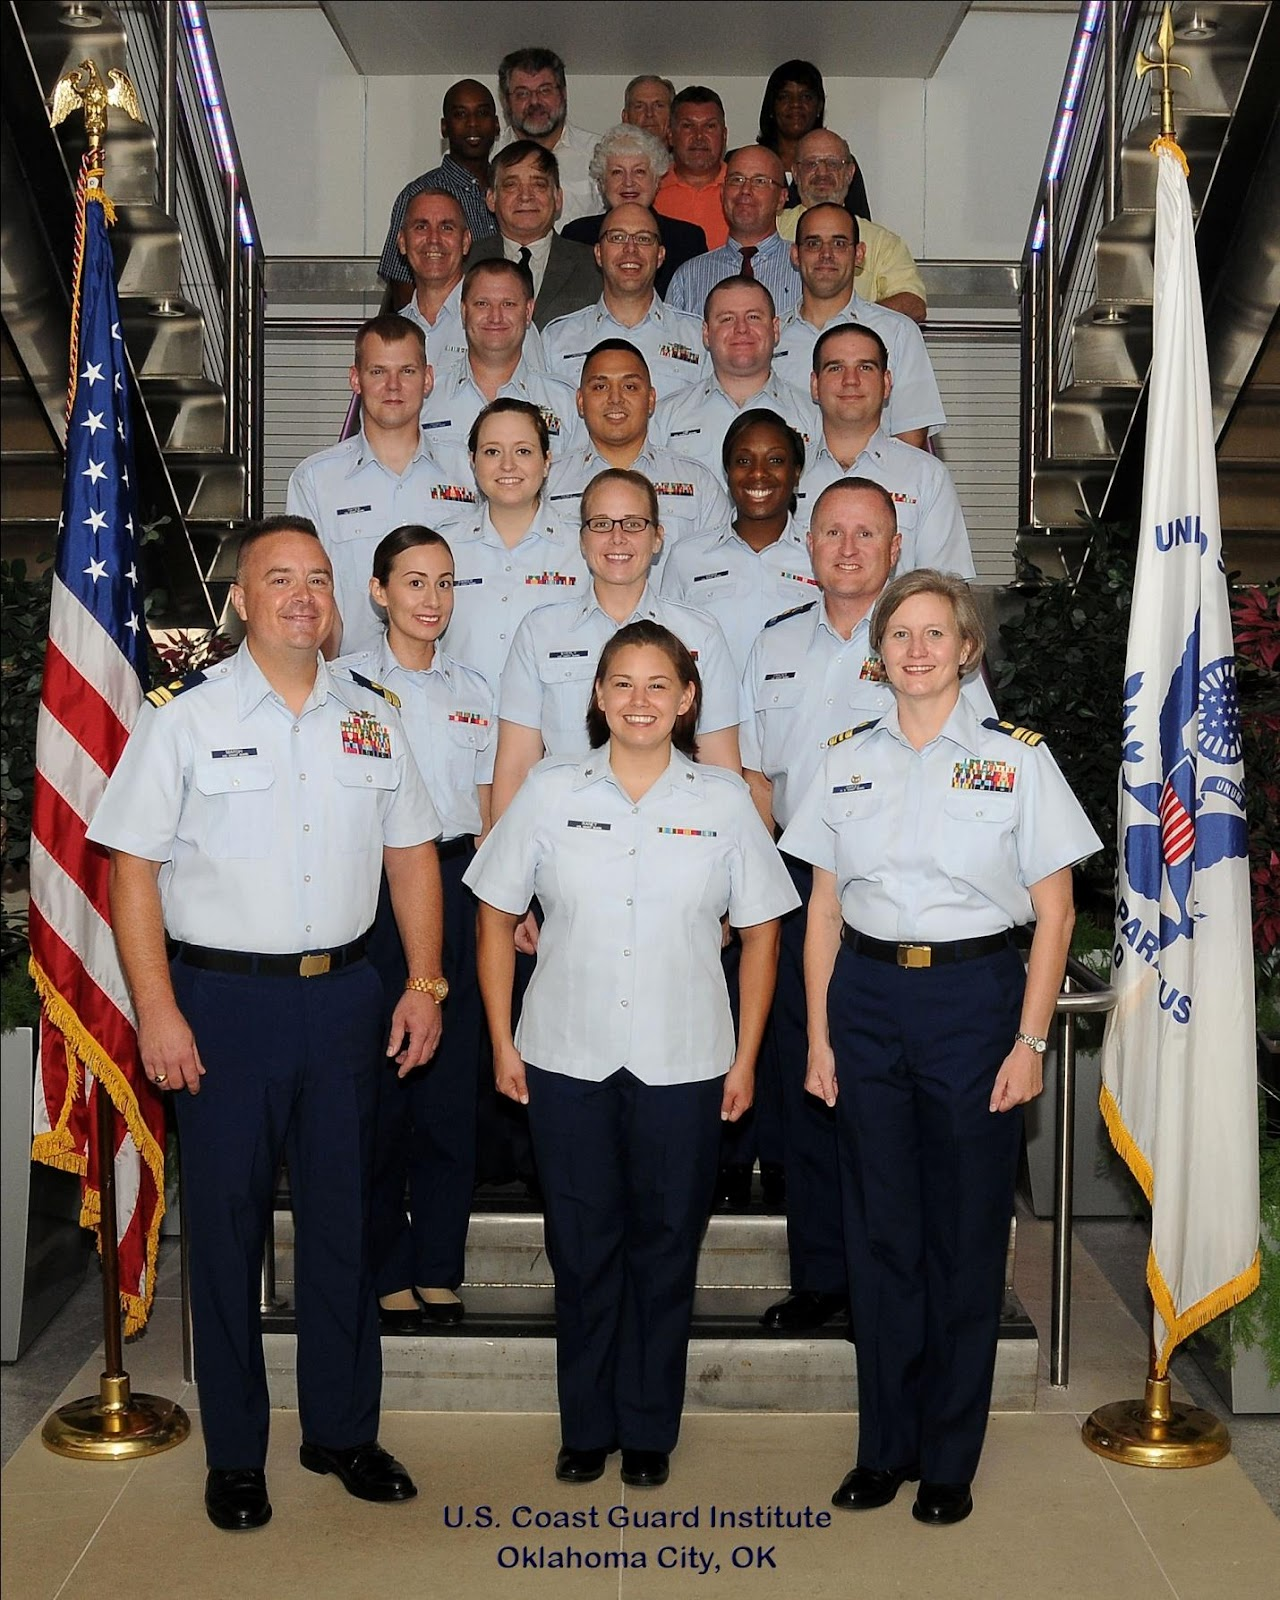 C:UsersCoeffDesktopArmy Base PicsCoast Guard Institute in Oklahoma City, OK2_3b_USCGITeam.jpg